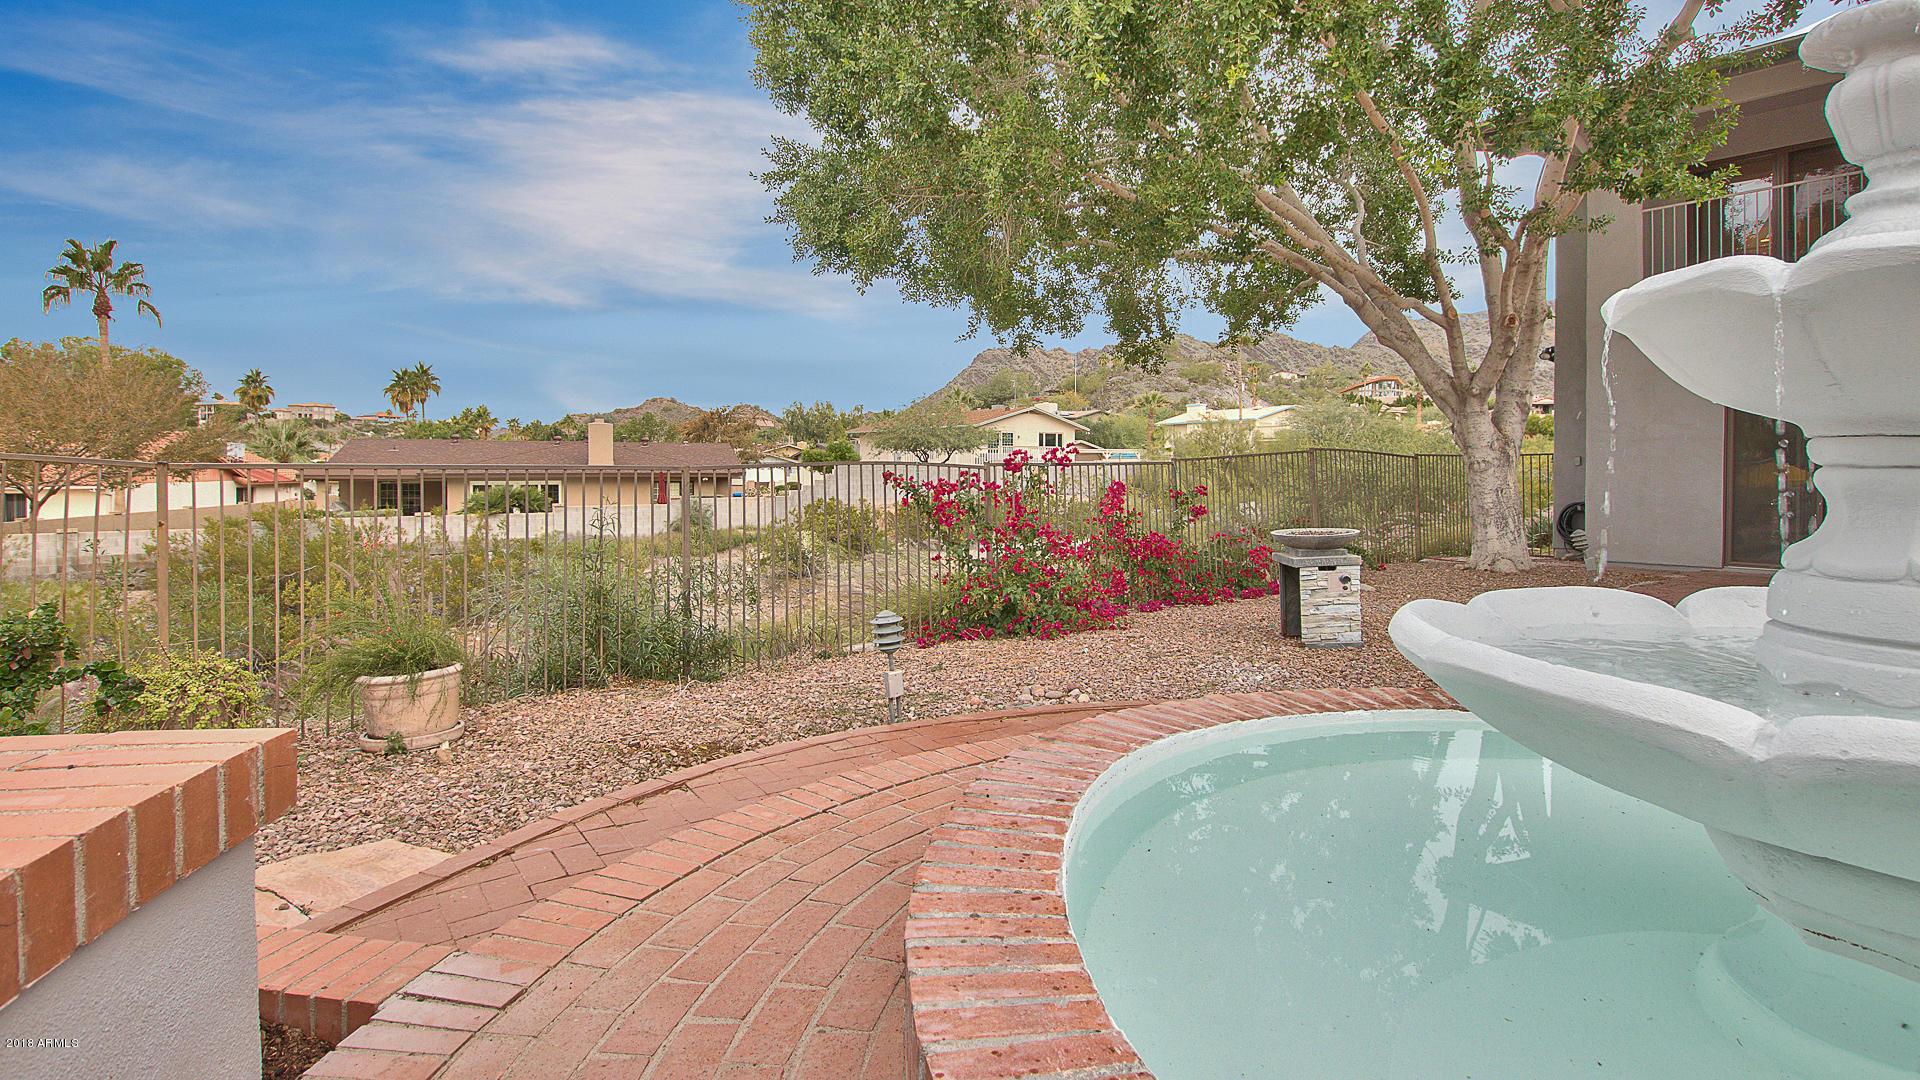 7332 N 23RD Street Phoenix, AZ 85020 - MLS #: 5852609